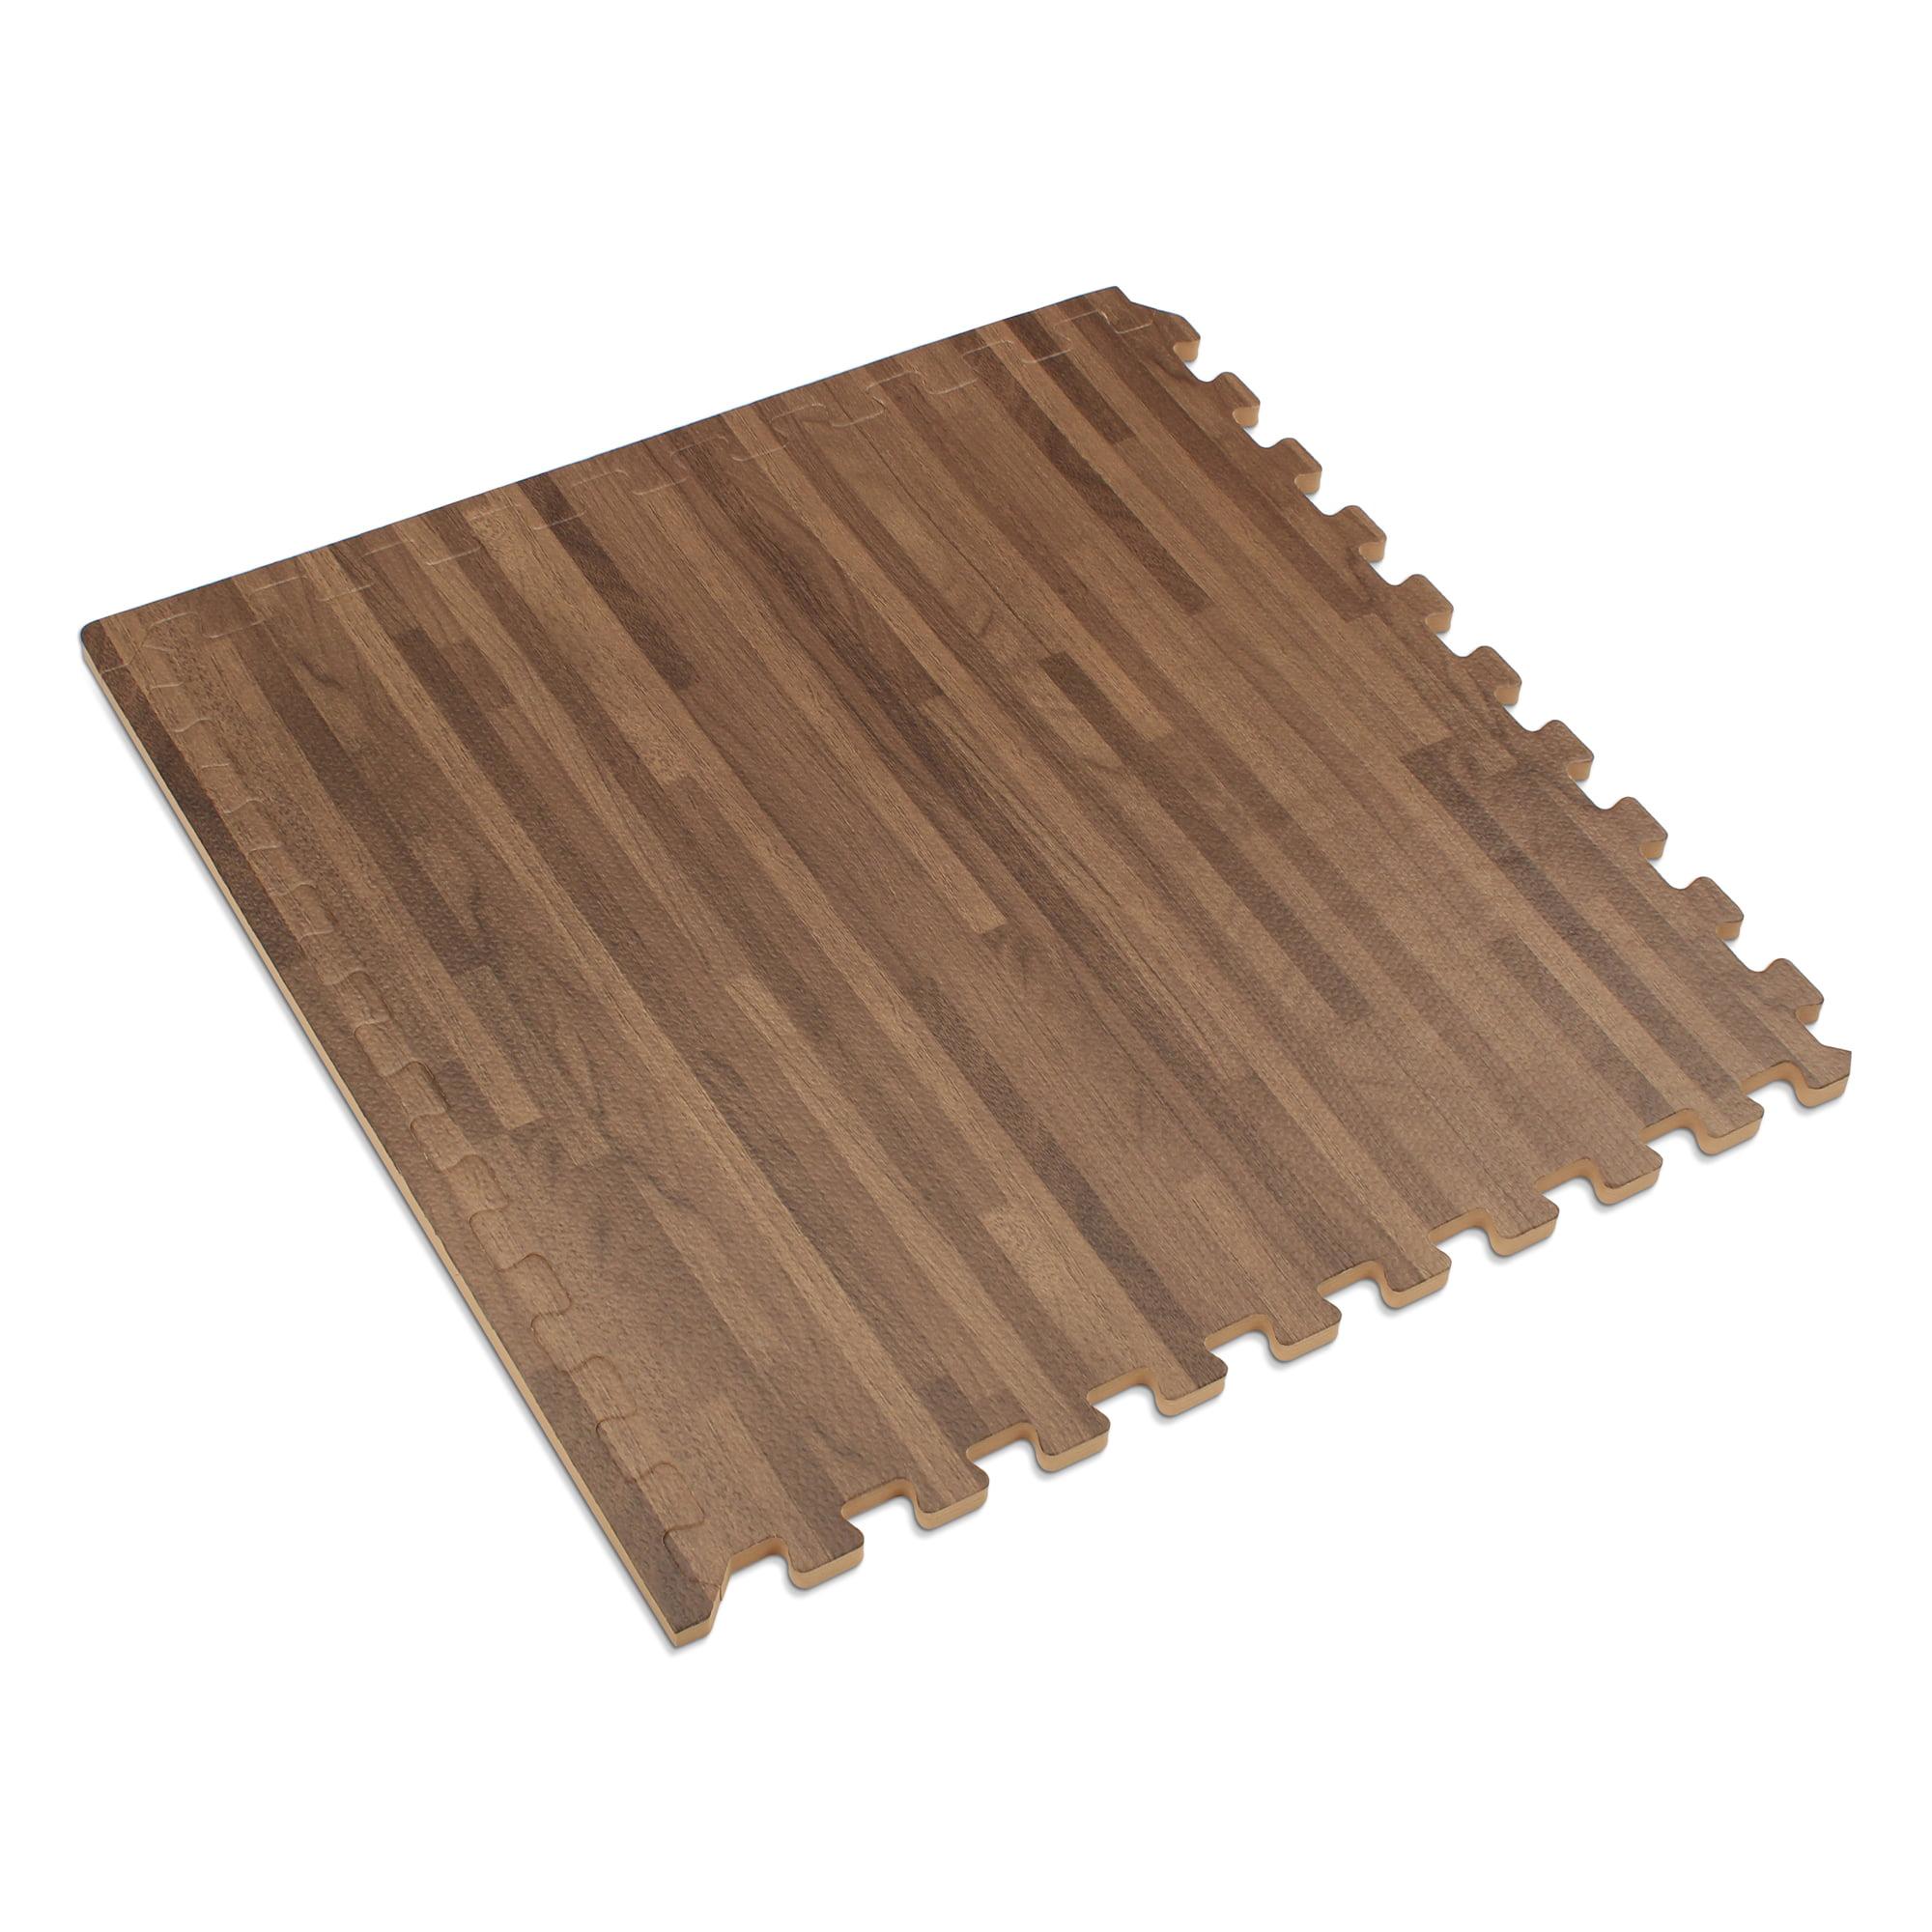 "Forest Floor 5/8"" Thick Printed Wood Grain Interlocking Foam Floor Mats, 16 Sq Ft (4 Tiles), Walnut - Walmart.com"